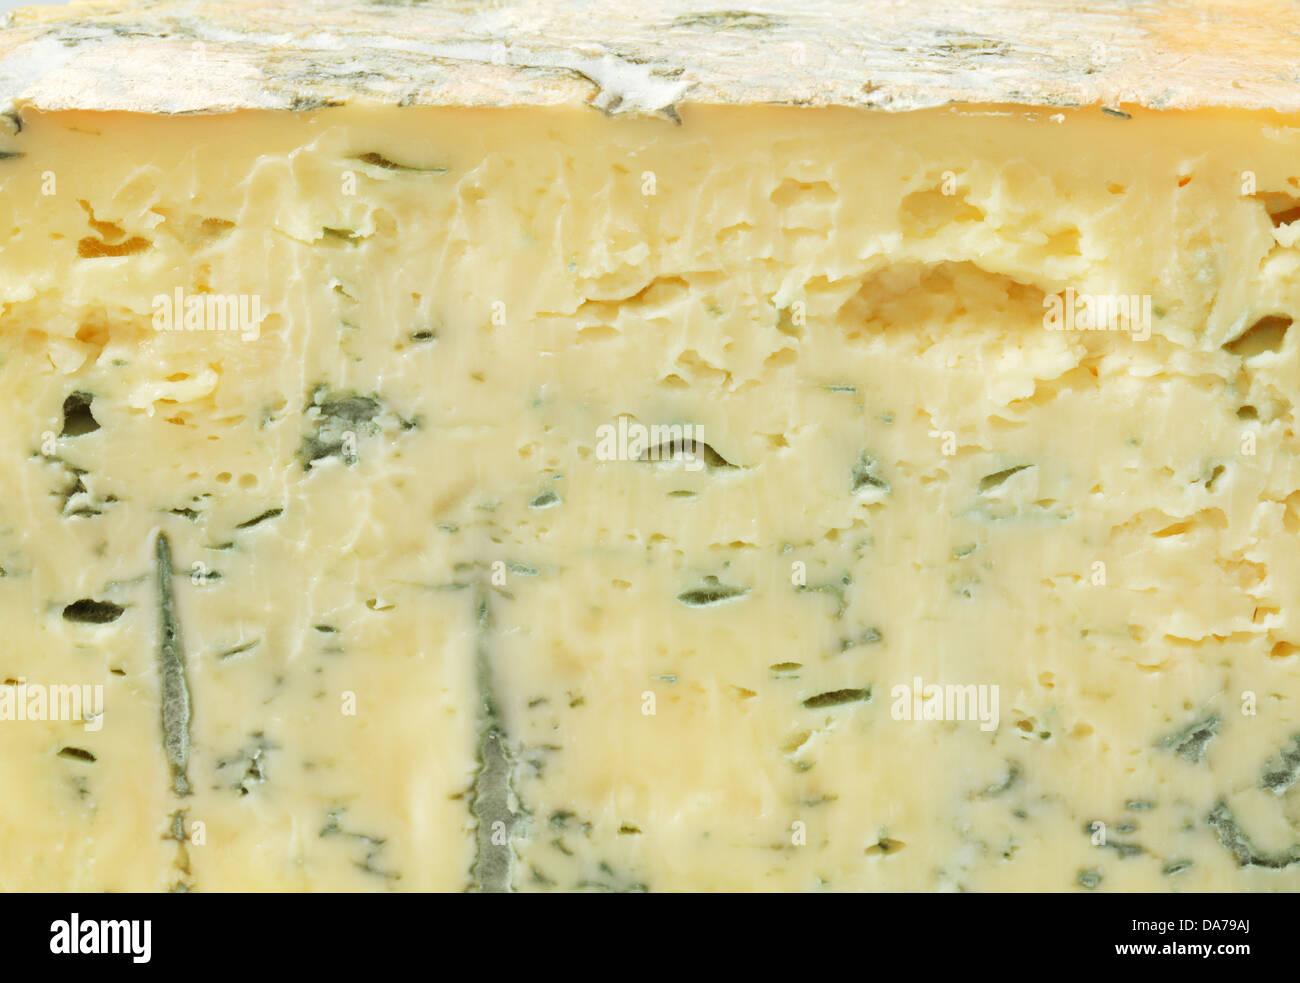 Detail of blue cheese - full frame - Stock Image